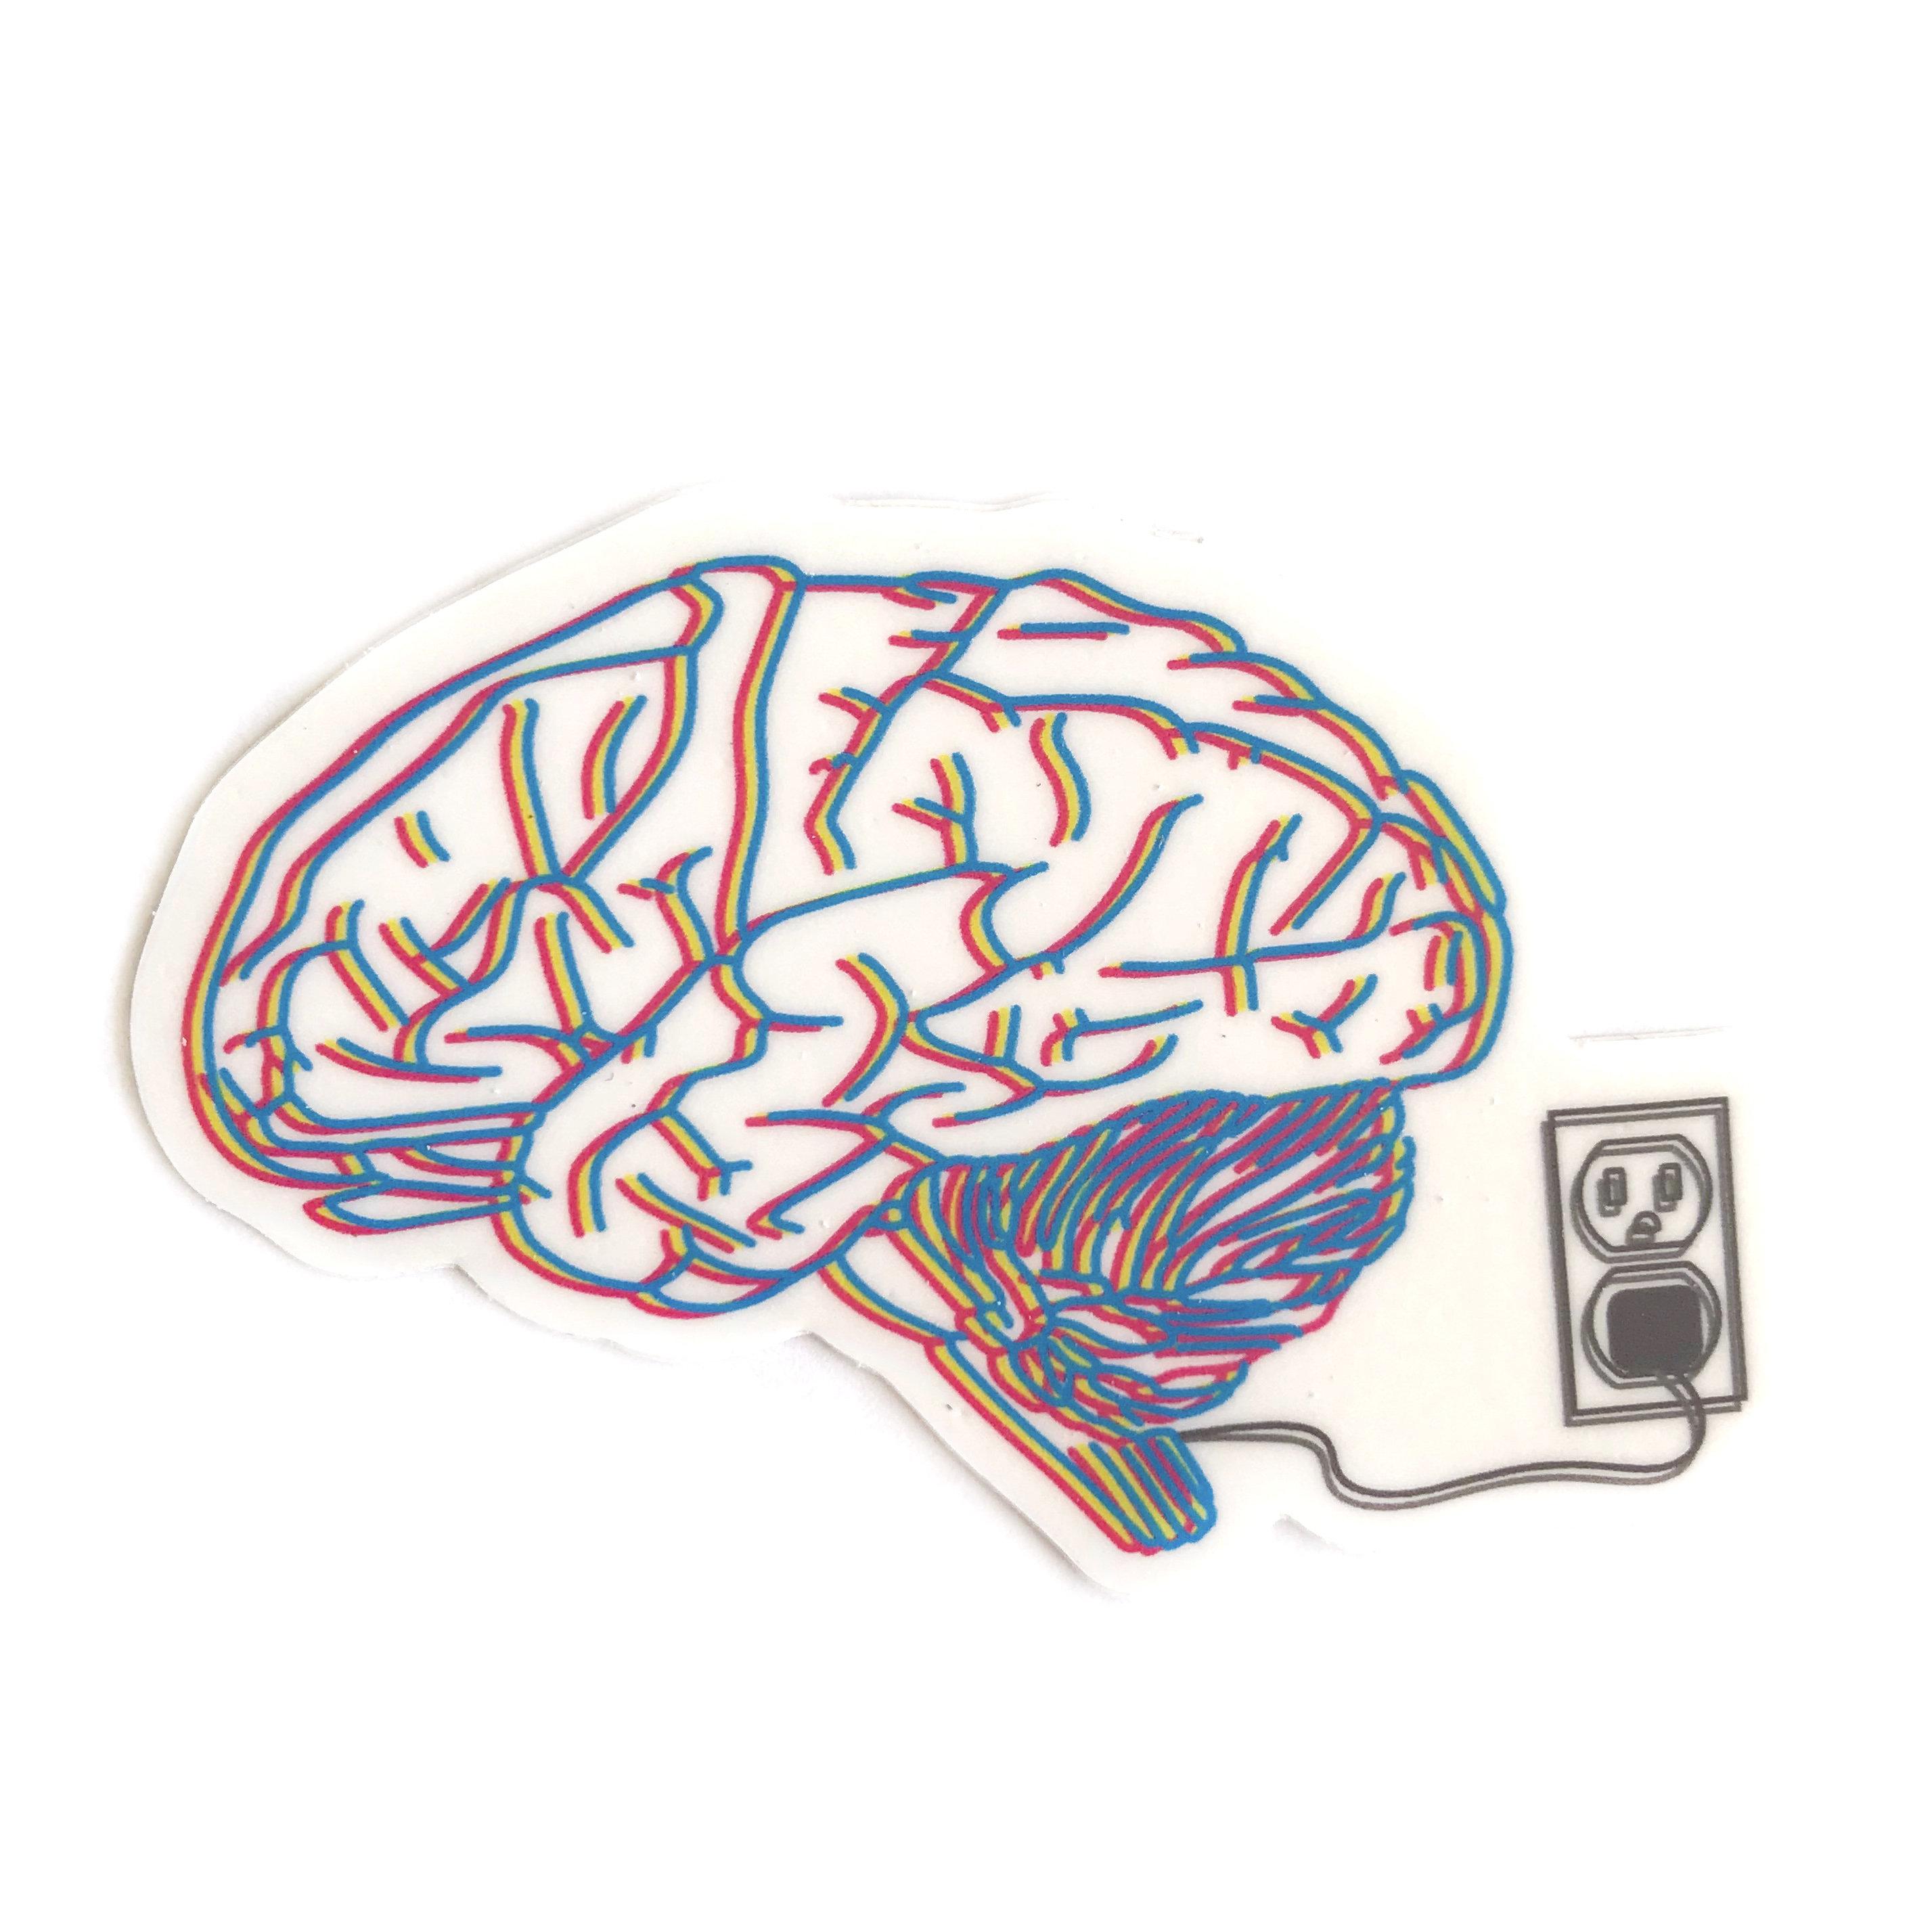 2855x2855 anatomy sticker vinyl sticker electric shock therapy brain etsy